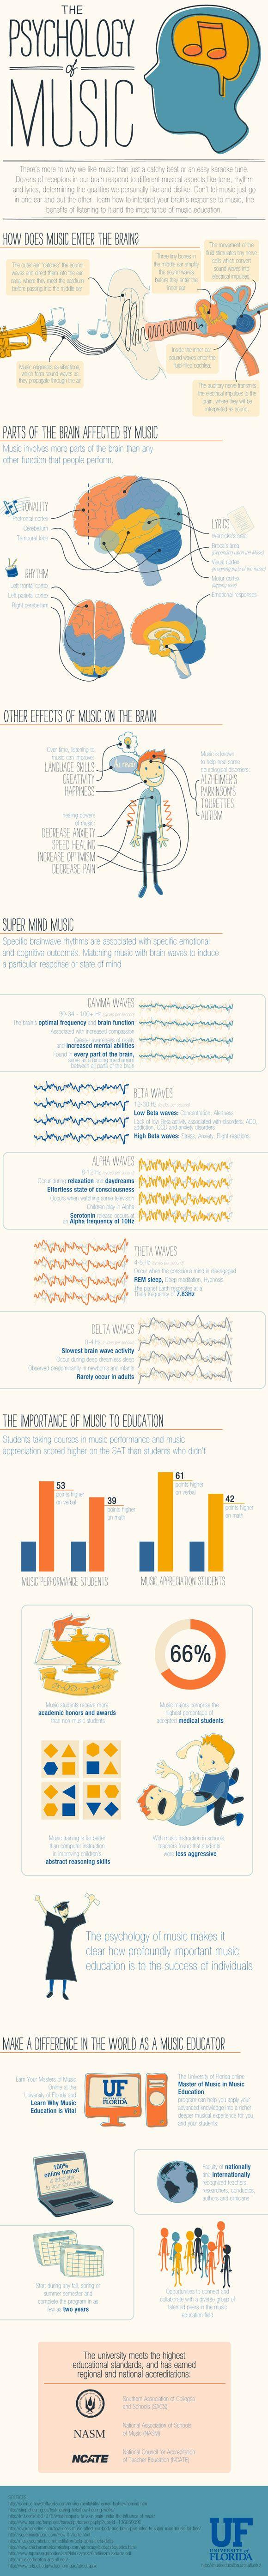 Psychology Of Music